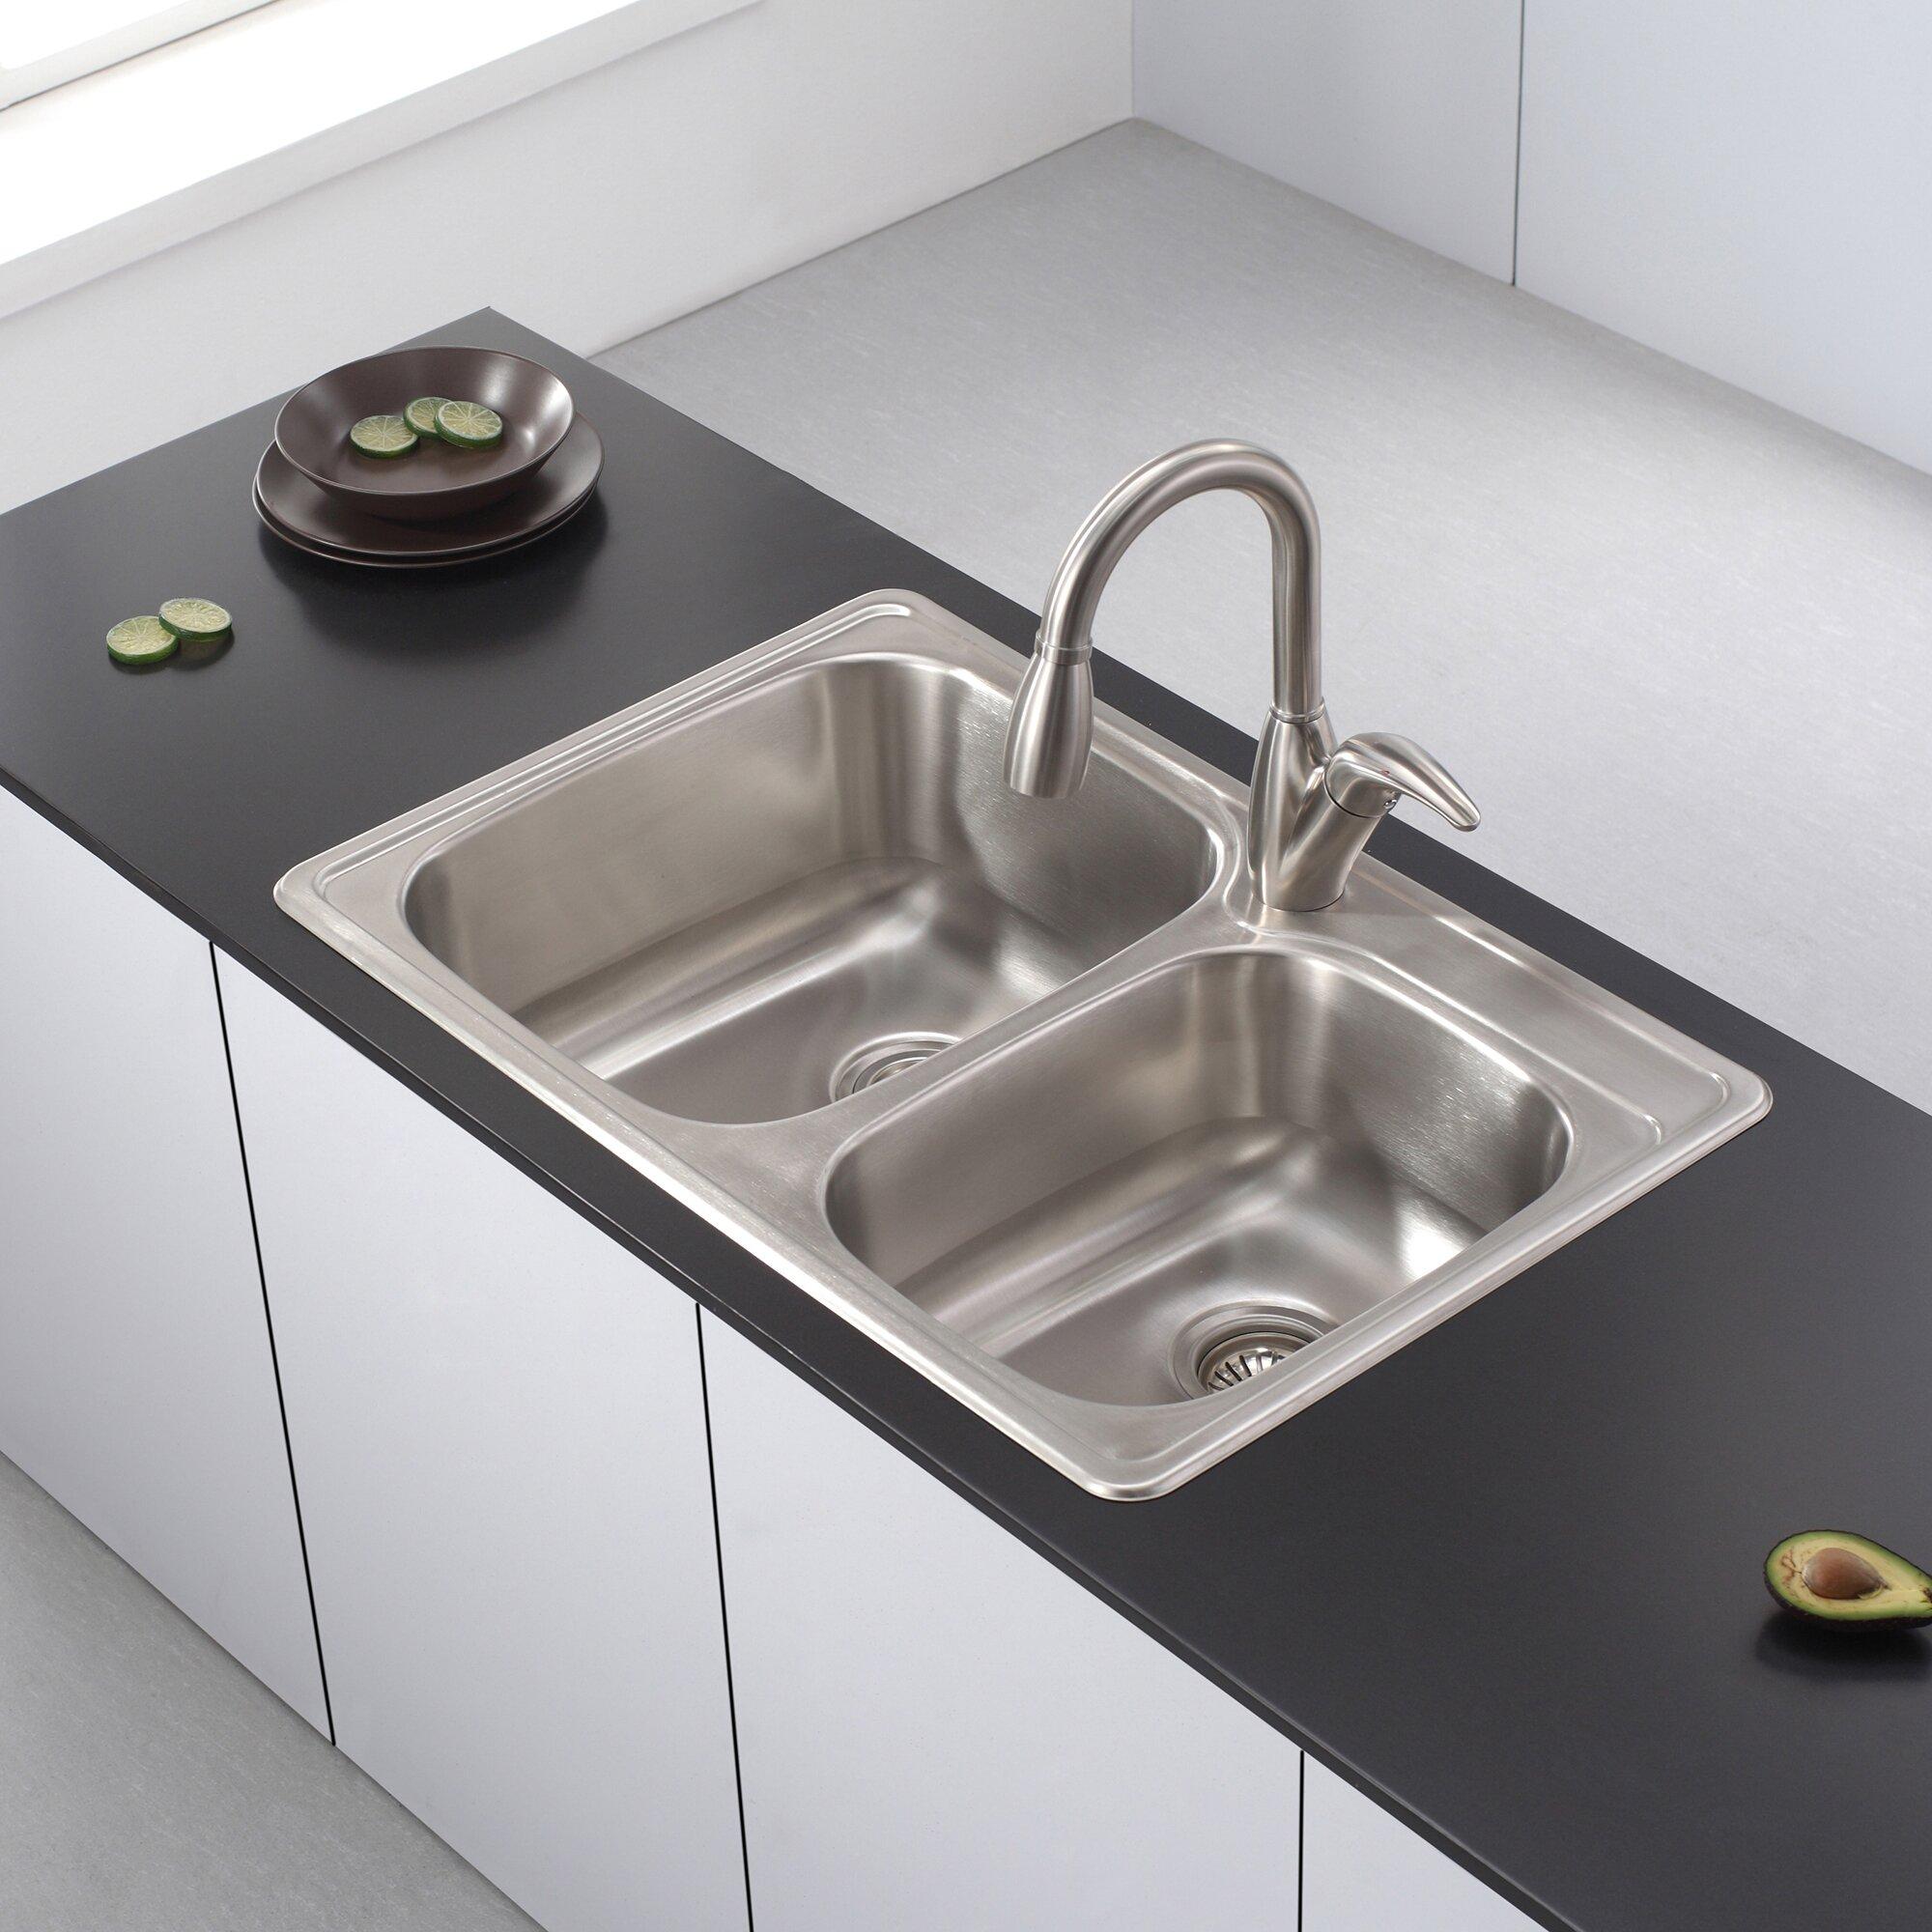 Top Mount Kitchen Sinks : ... Piece Topmount 60/40 Double Bowl Kitchen Sink Set & Reviews Wayfair